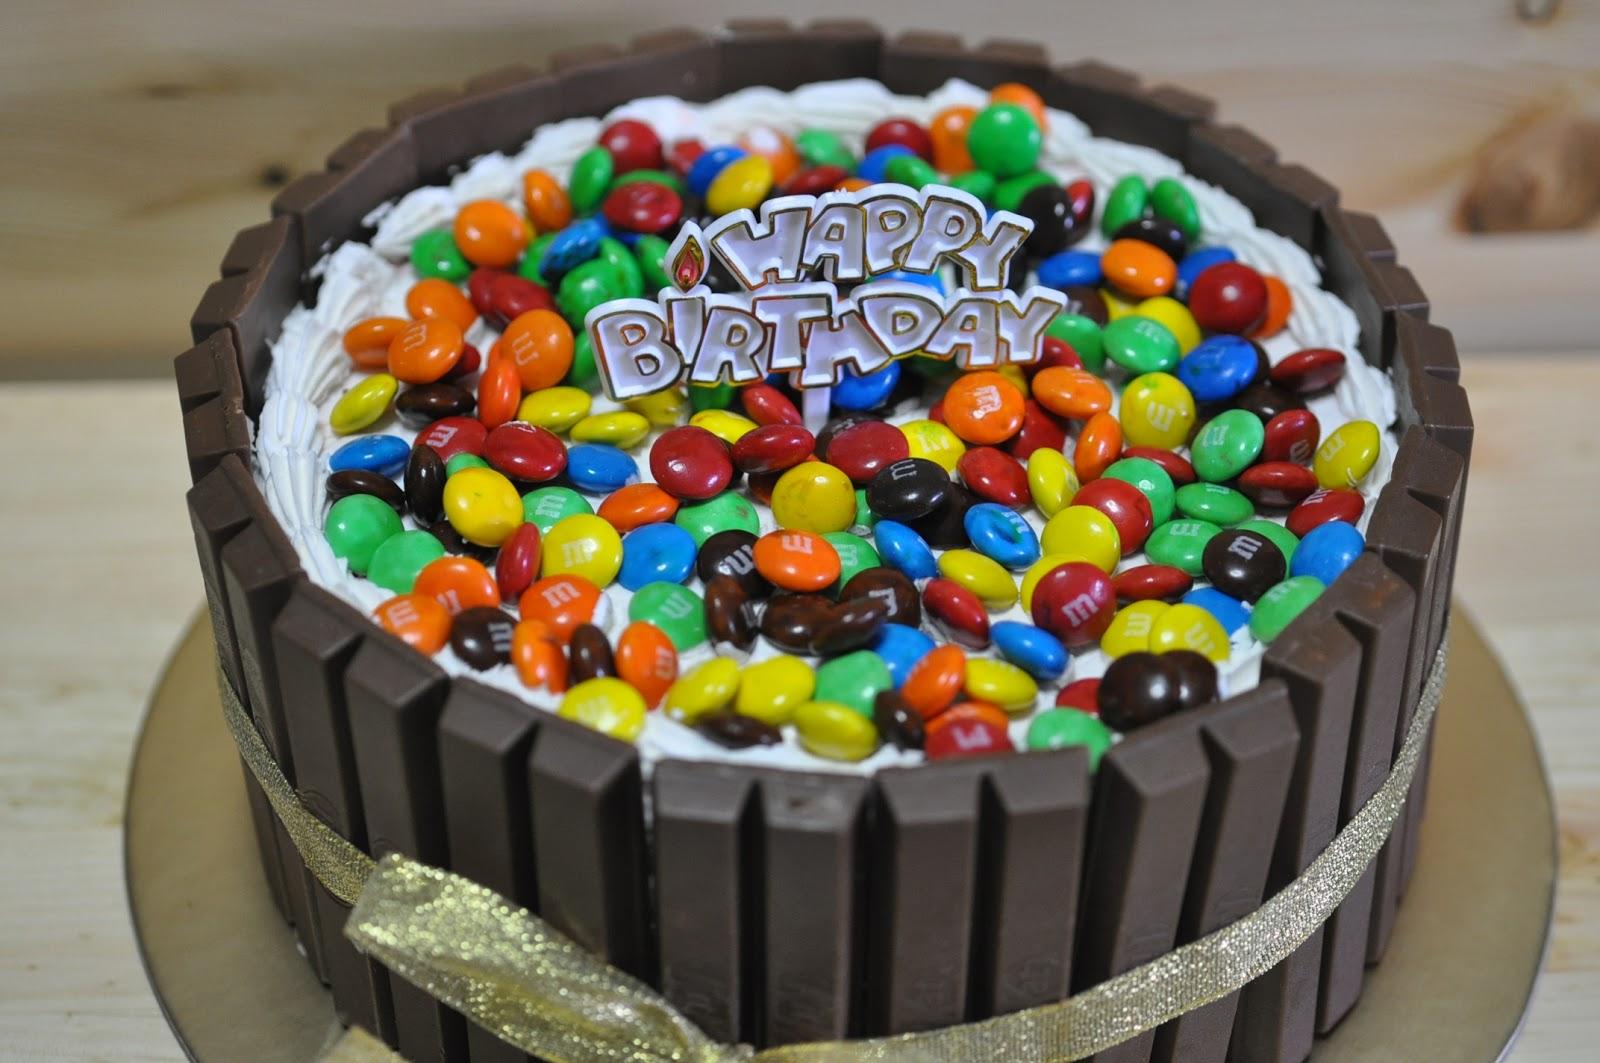 Izahs Kitchen Raibow Kitkat and MM cake